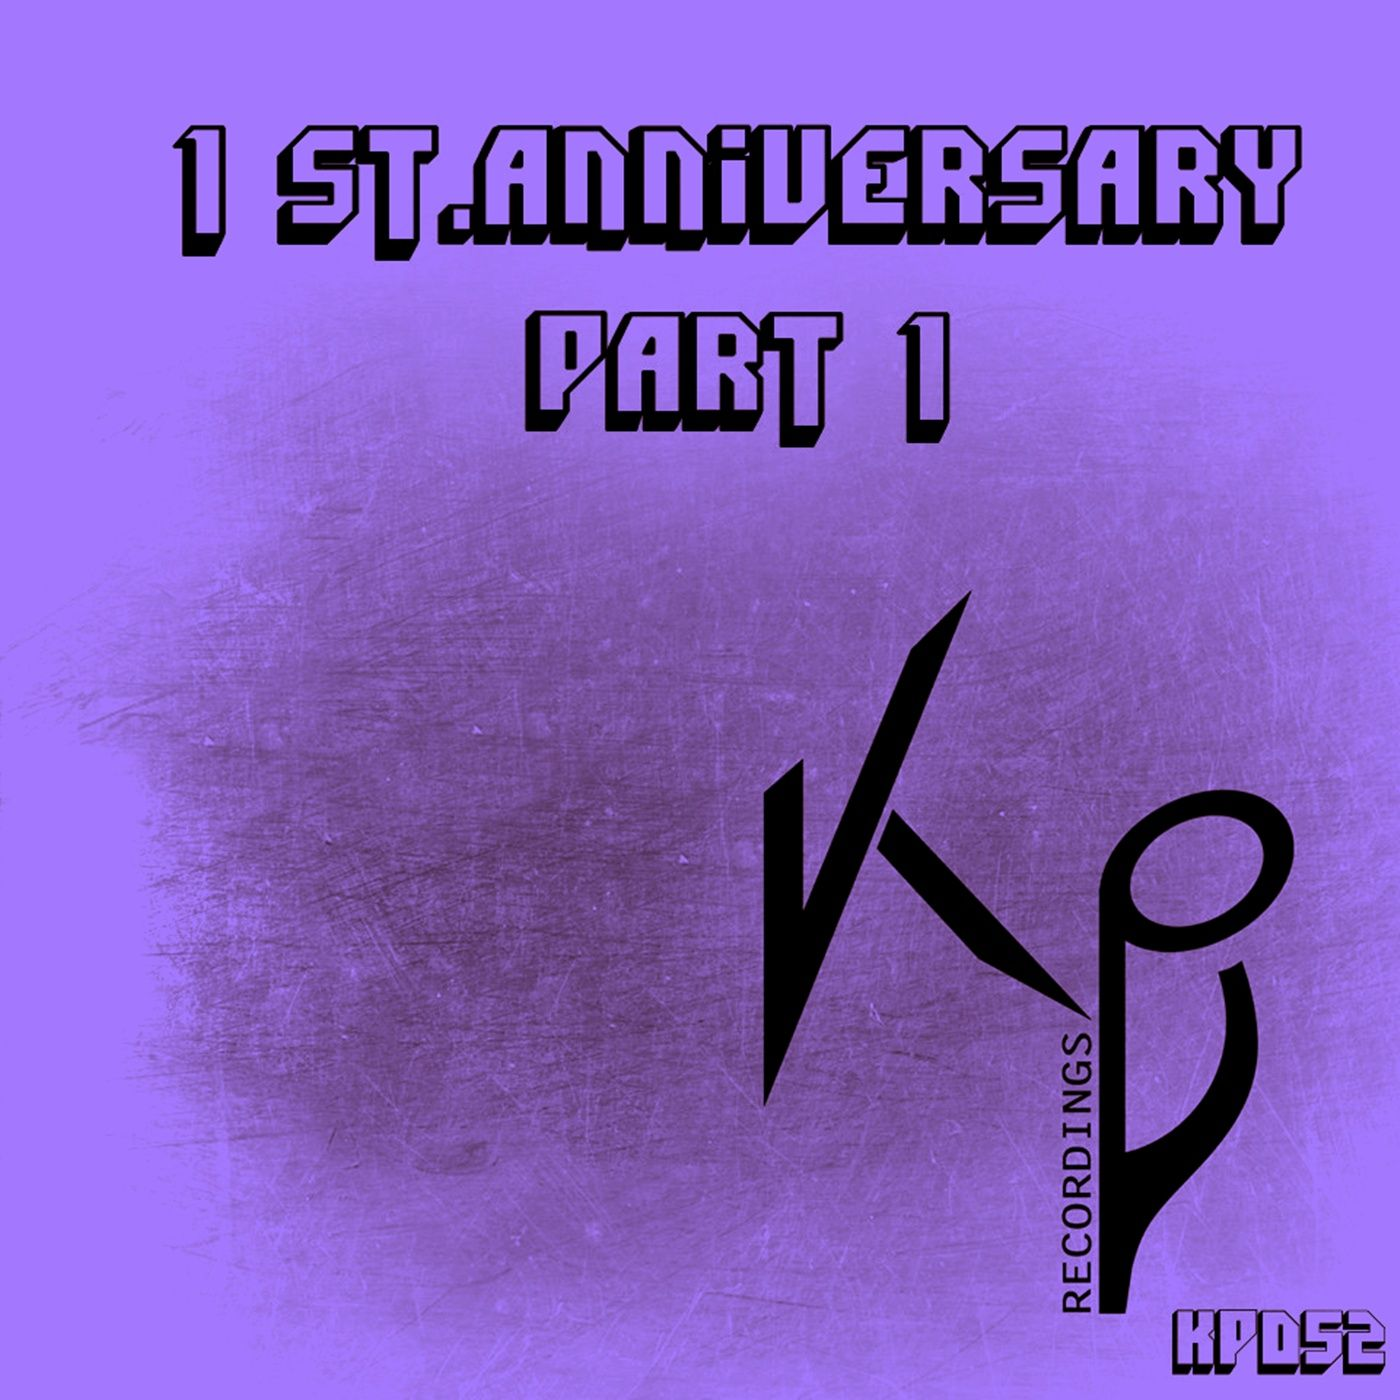 1 St. Anniversary (Part 1) (KP052)